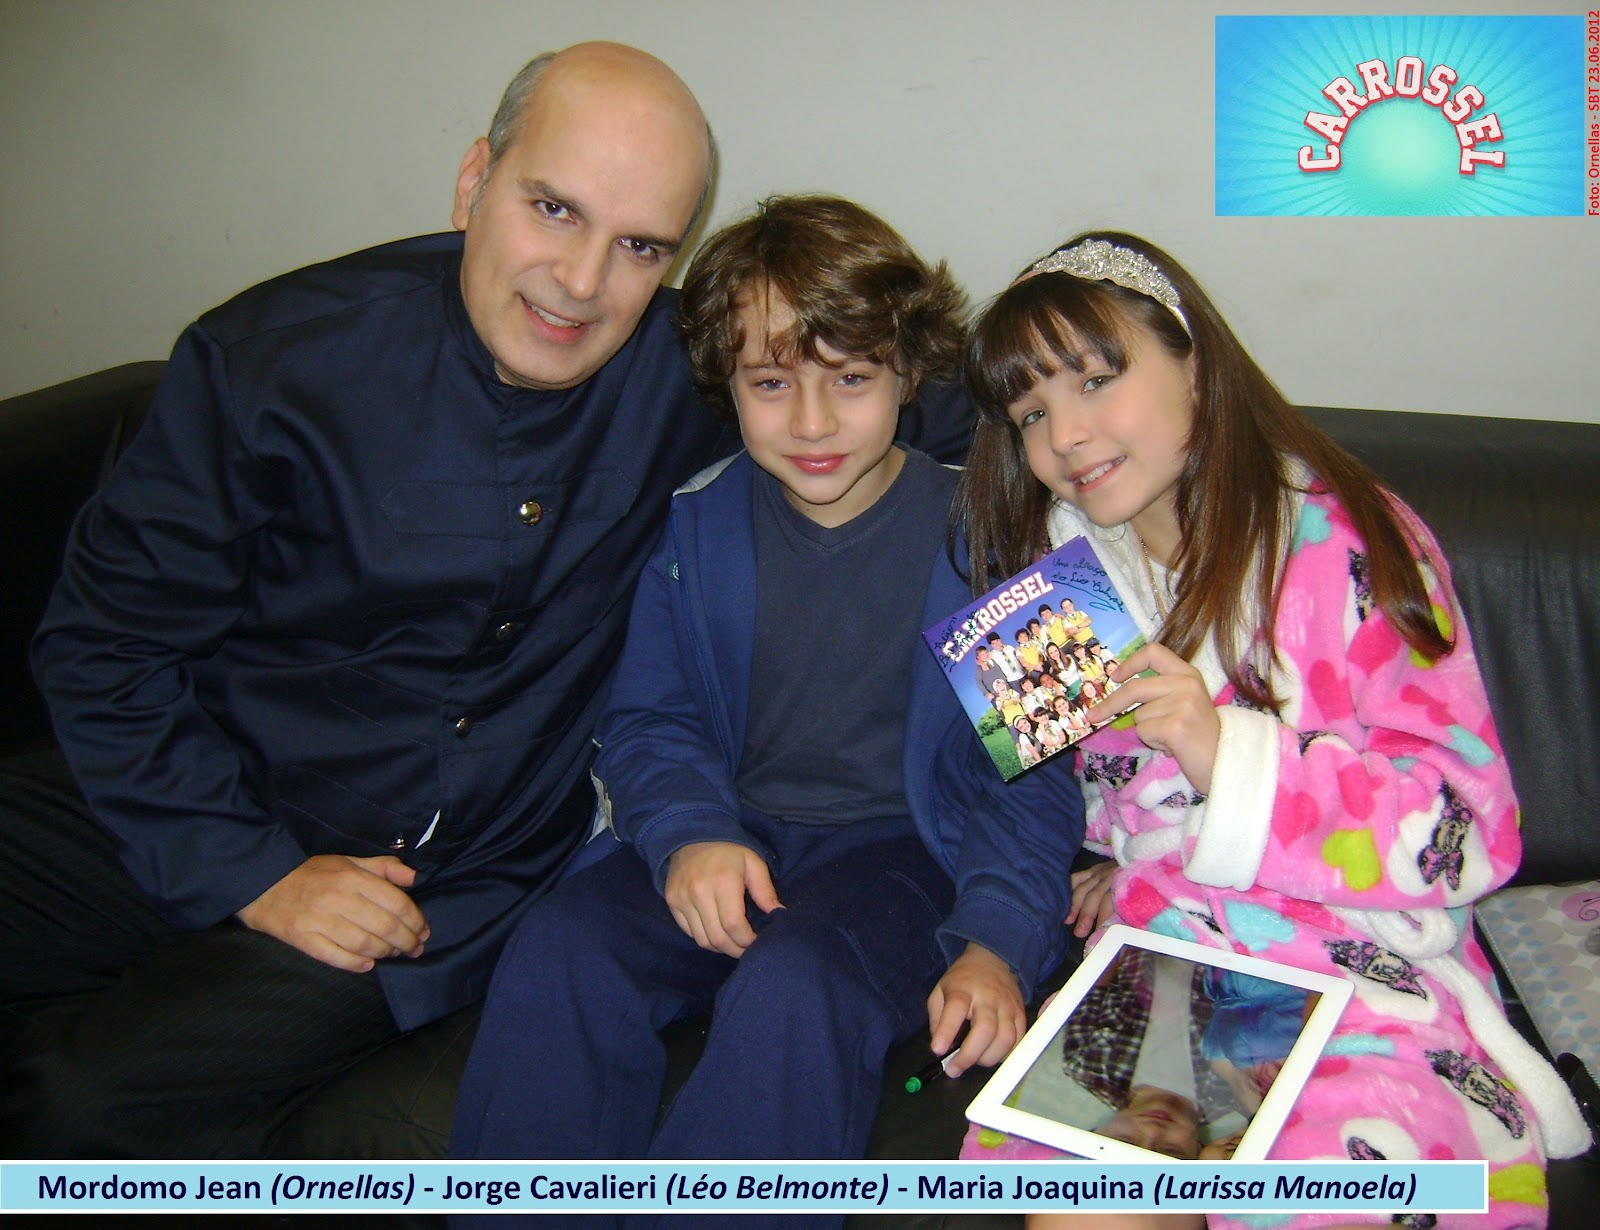 ... Jorge Cavalieri (Léo Belmonte) – Maria Joaquina (Larissa Manoela